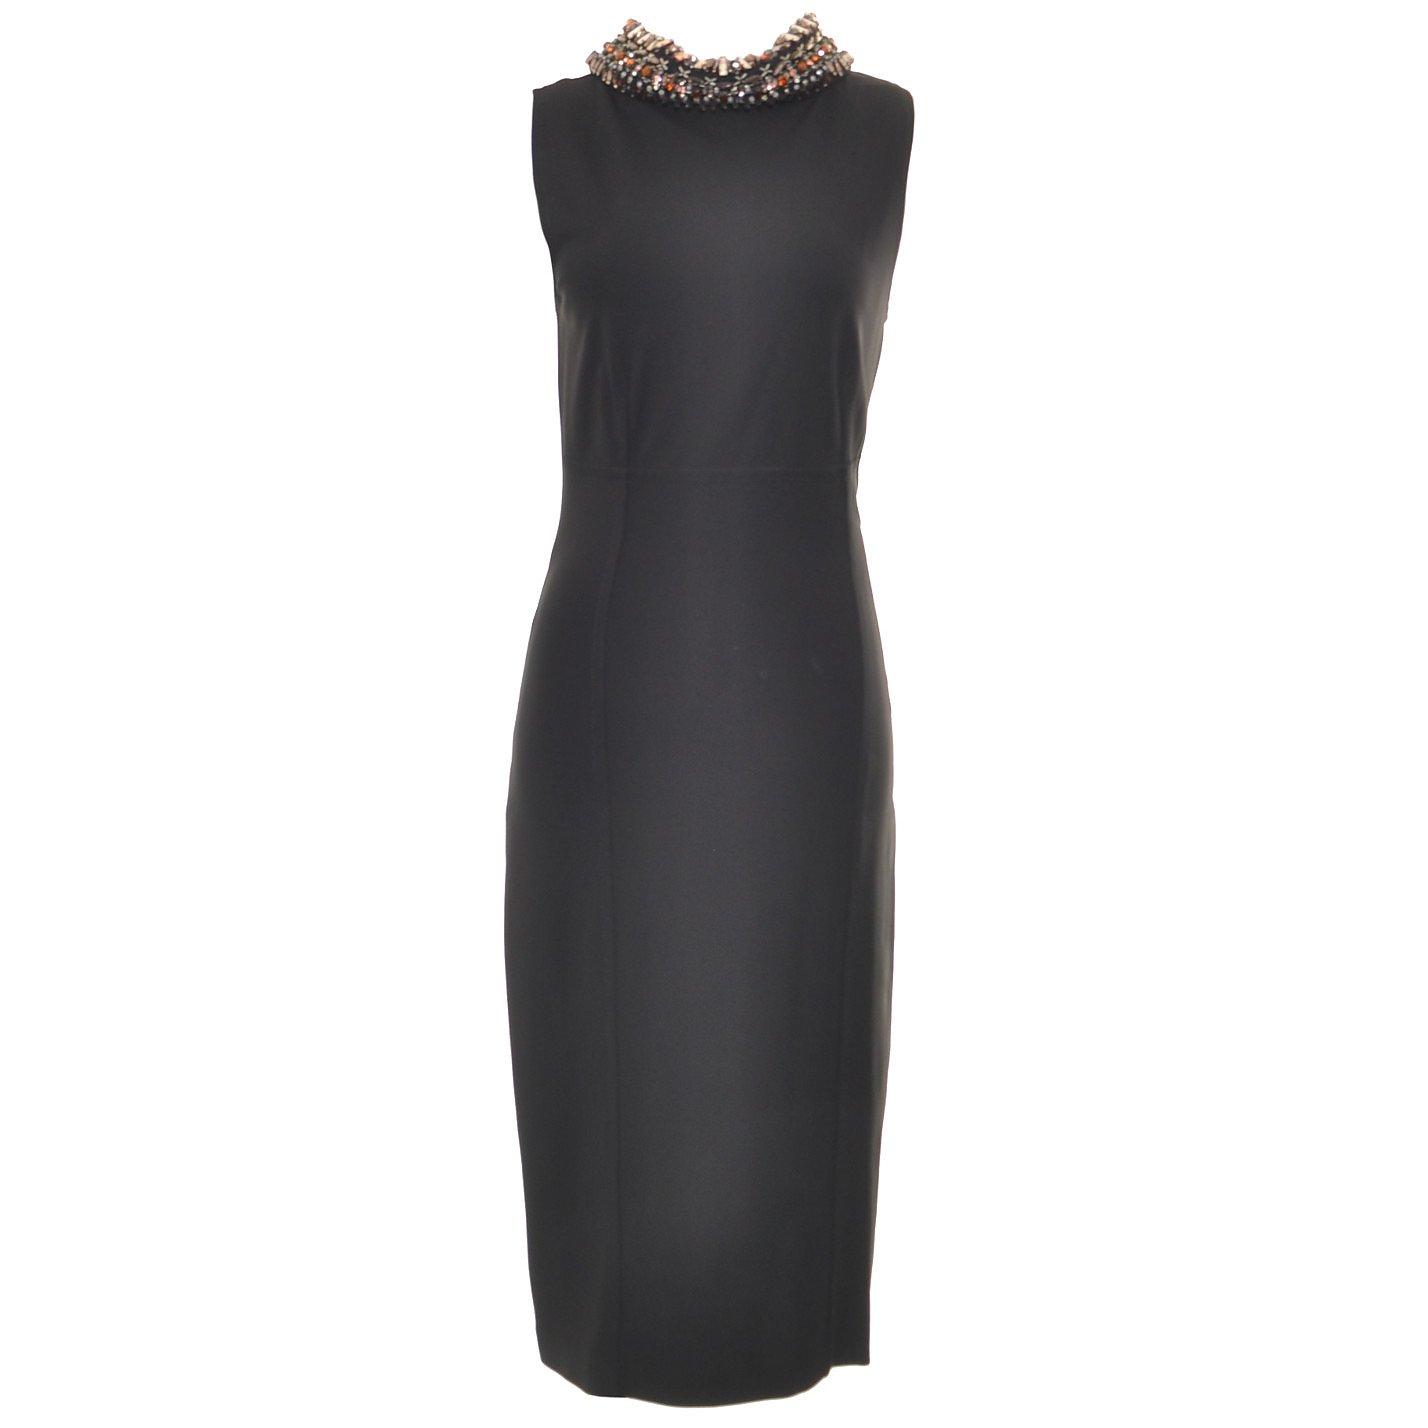 Valentino Embellished-Collar Dress